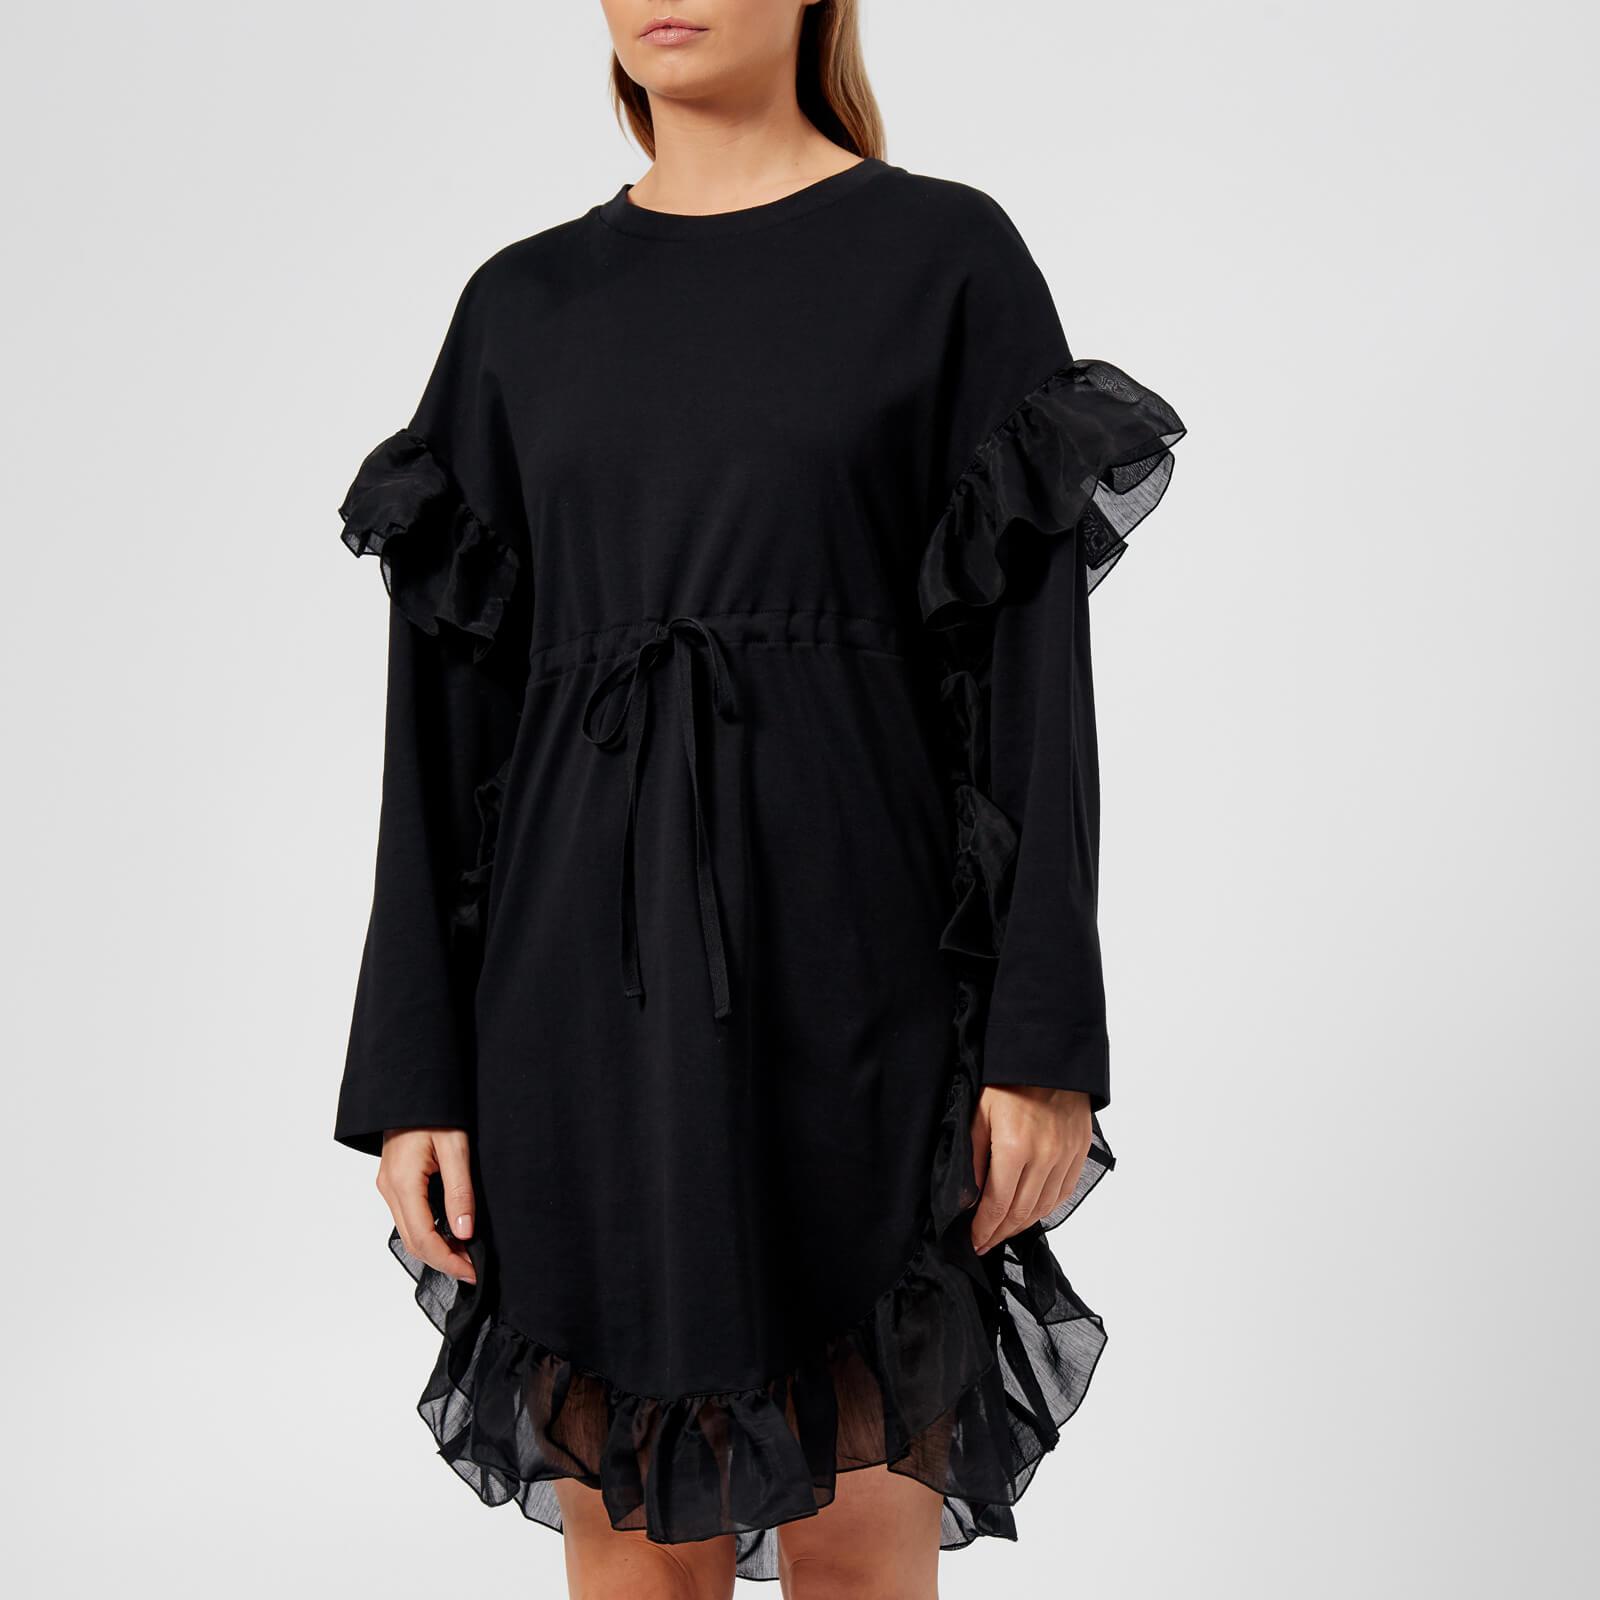 bbd0a6274c See By Chloé Women's Embellished T-Shirt Dress - Black